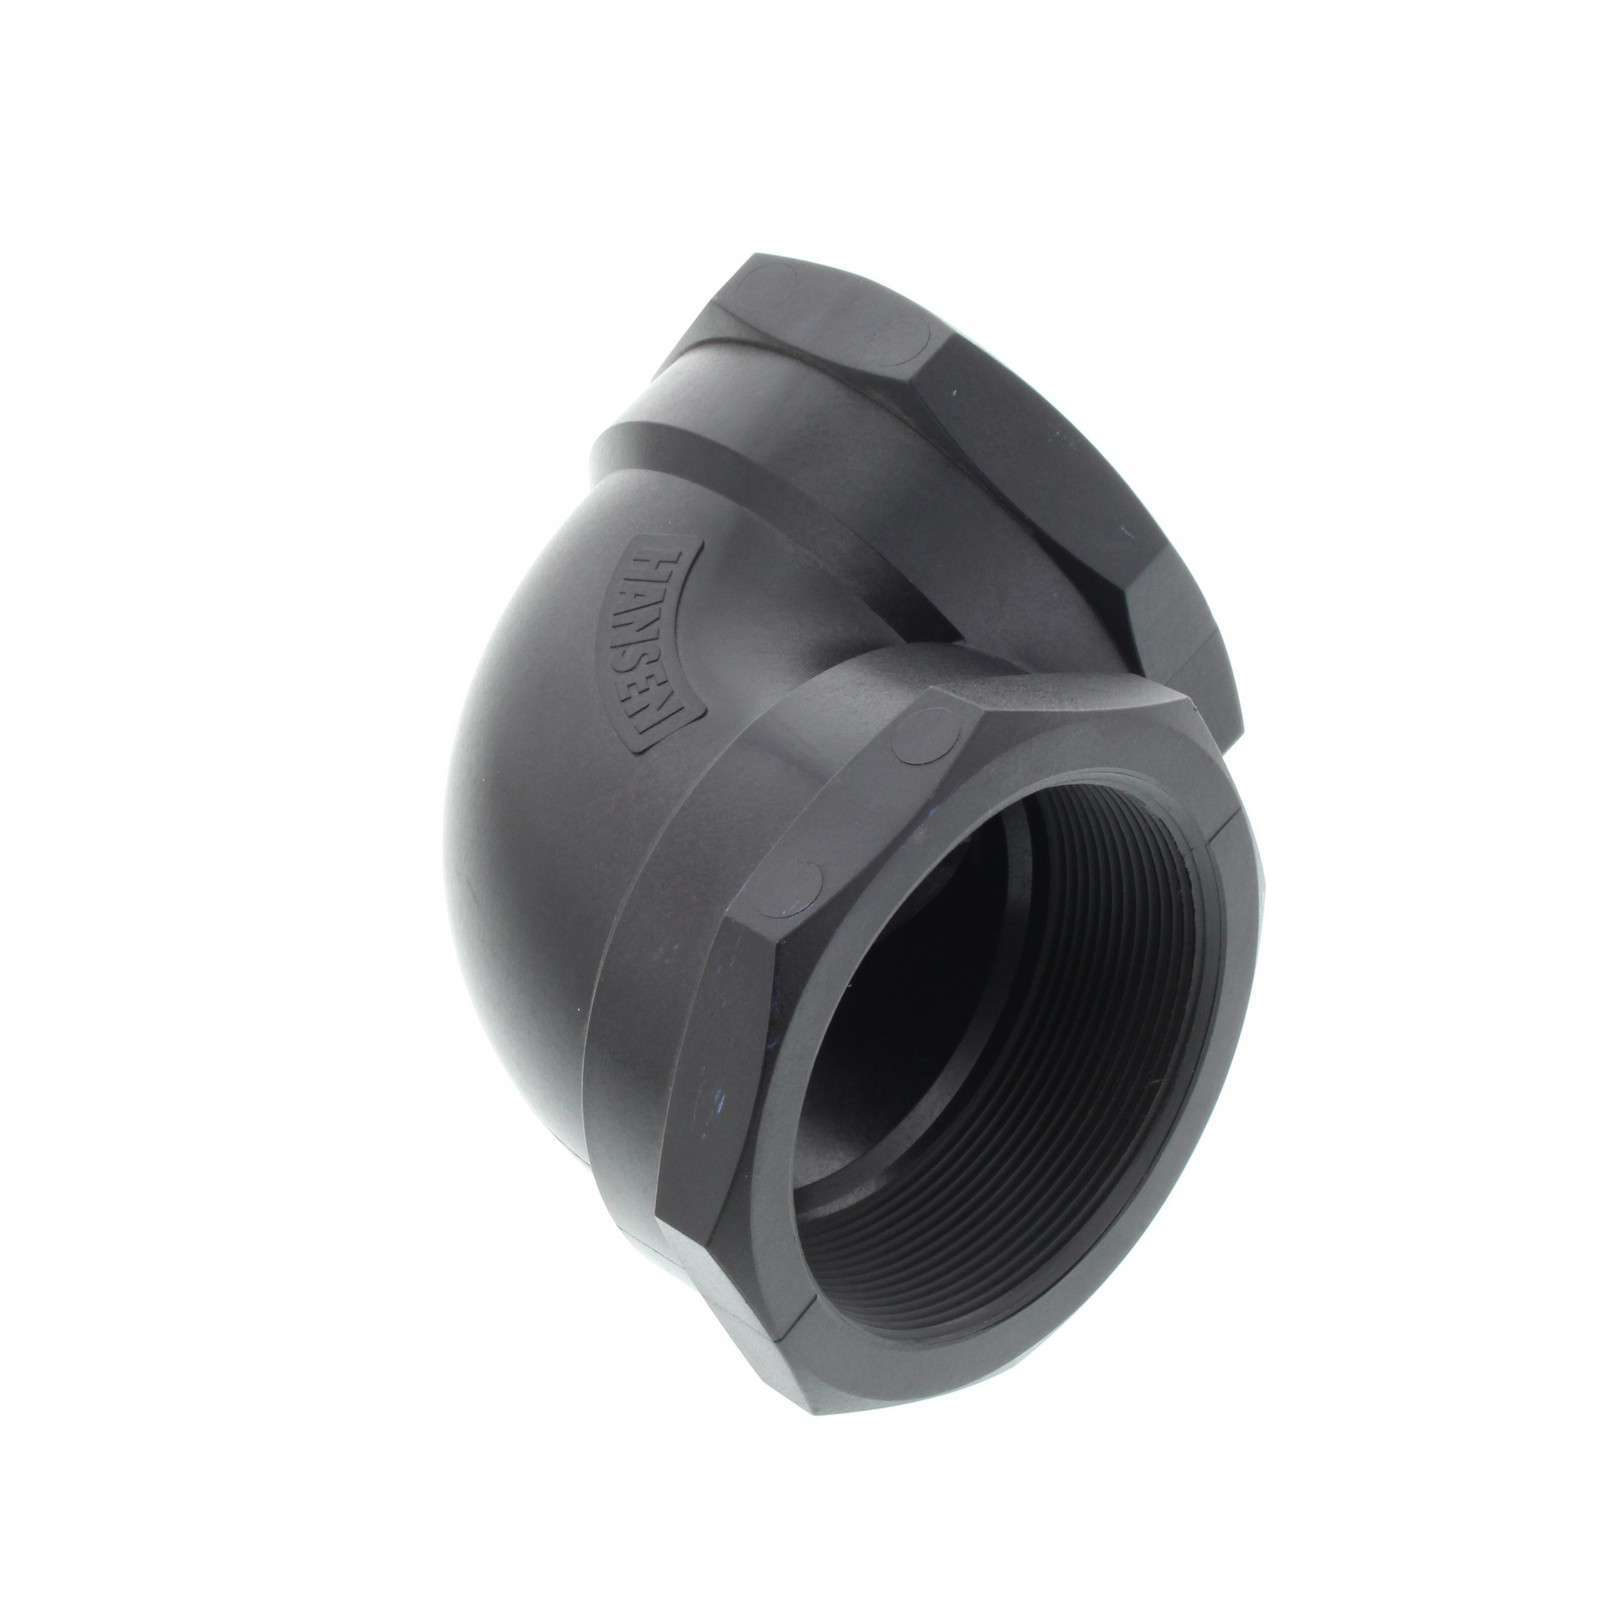 elbow 80mm female 90 degree bsp plumbing irrigation poly fitting water hansen 713541100213 ebay. Black Bedroom Furniture Sets. Home Design Ideas